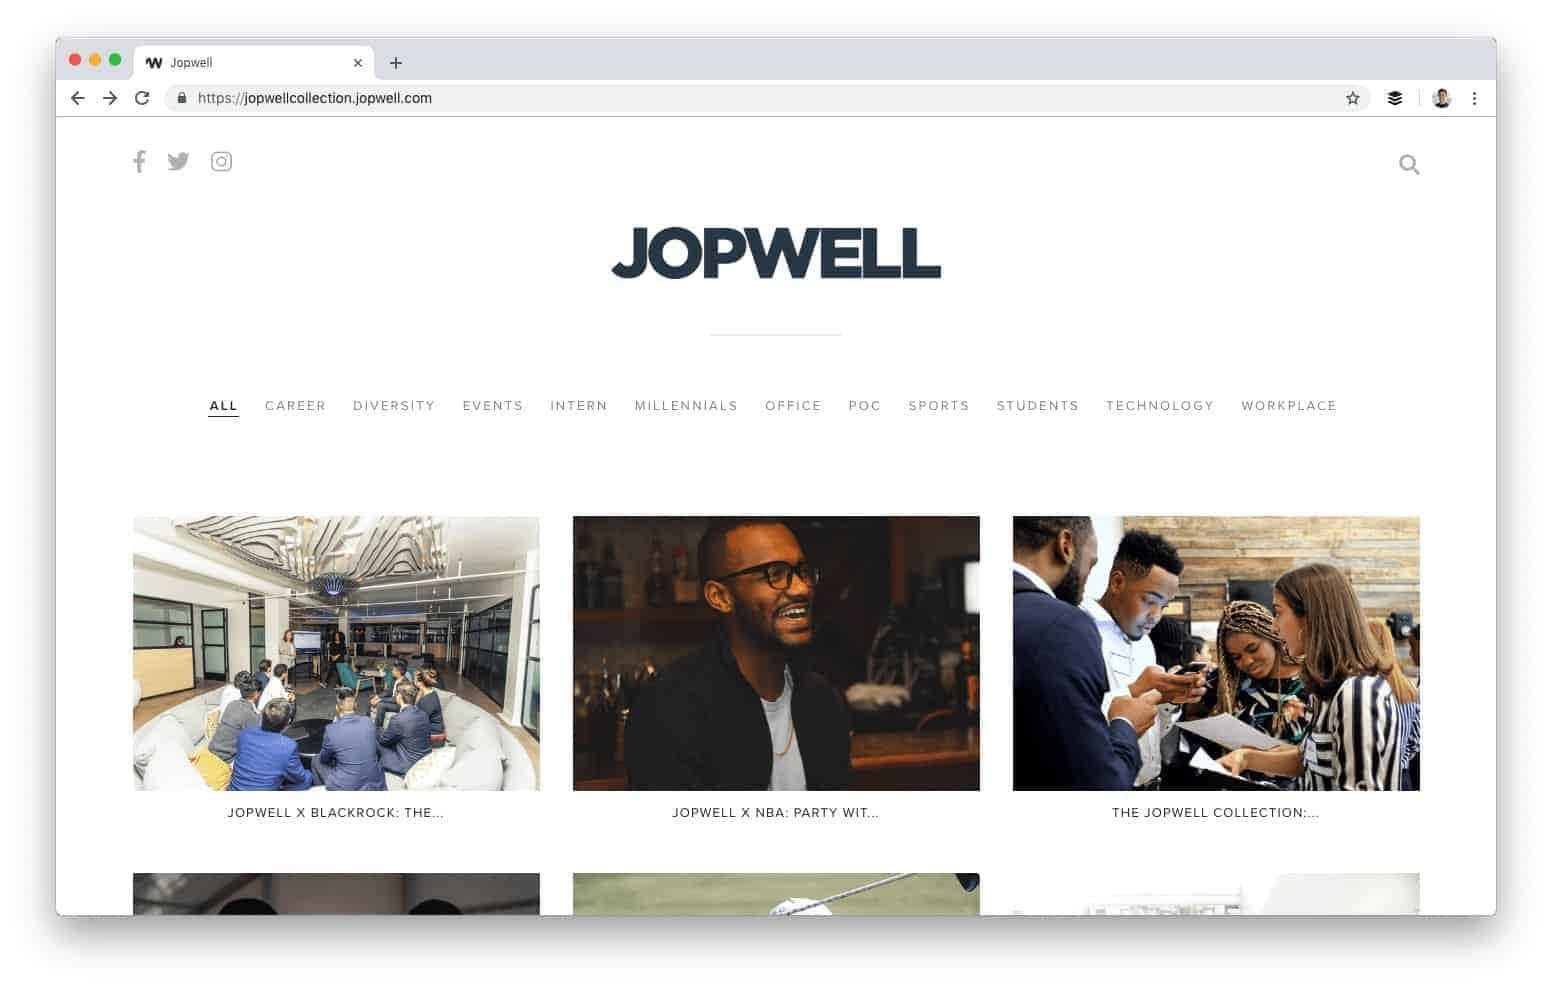 The Jopwell Collection אתרים להורדת תמונות בחינם